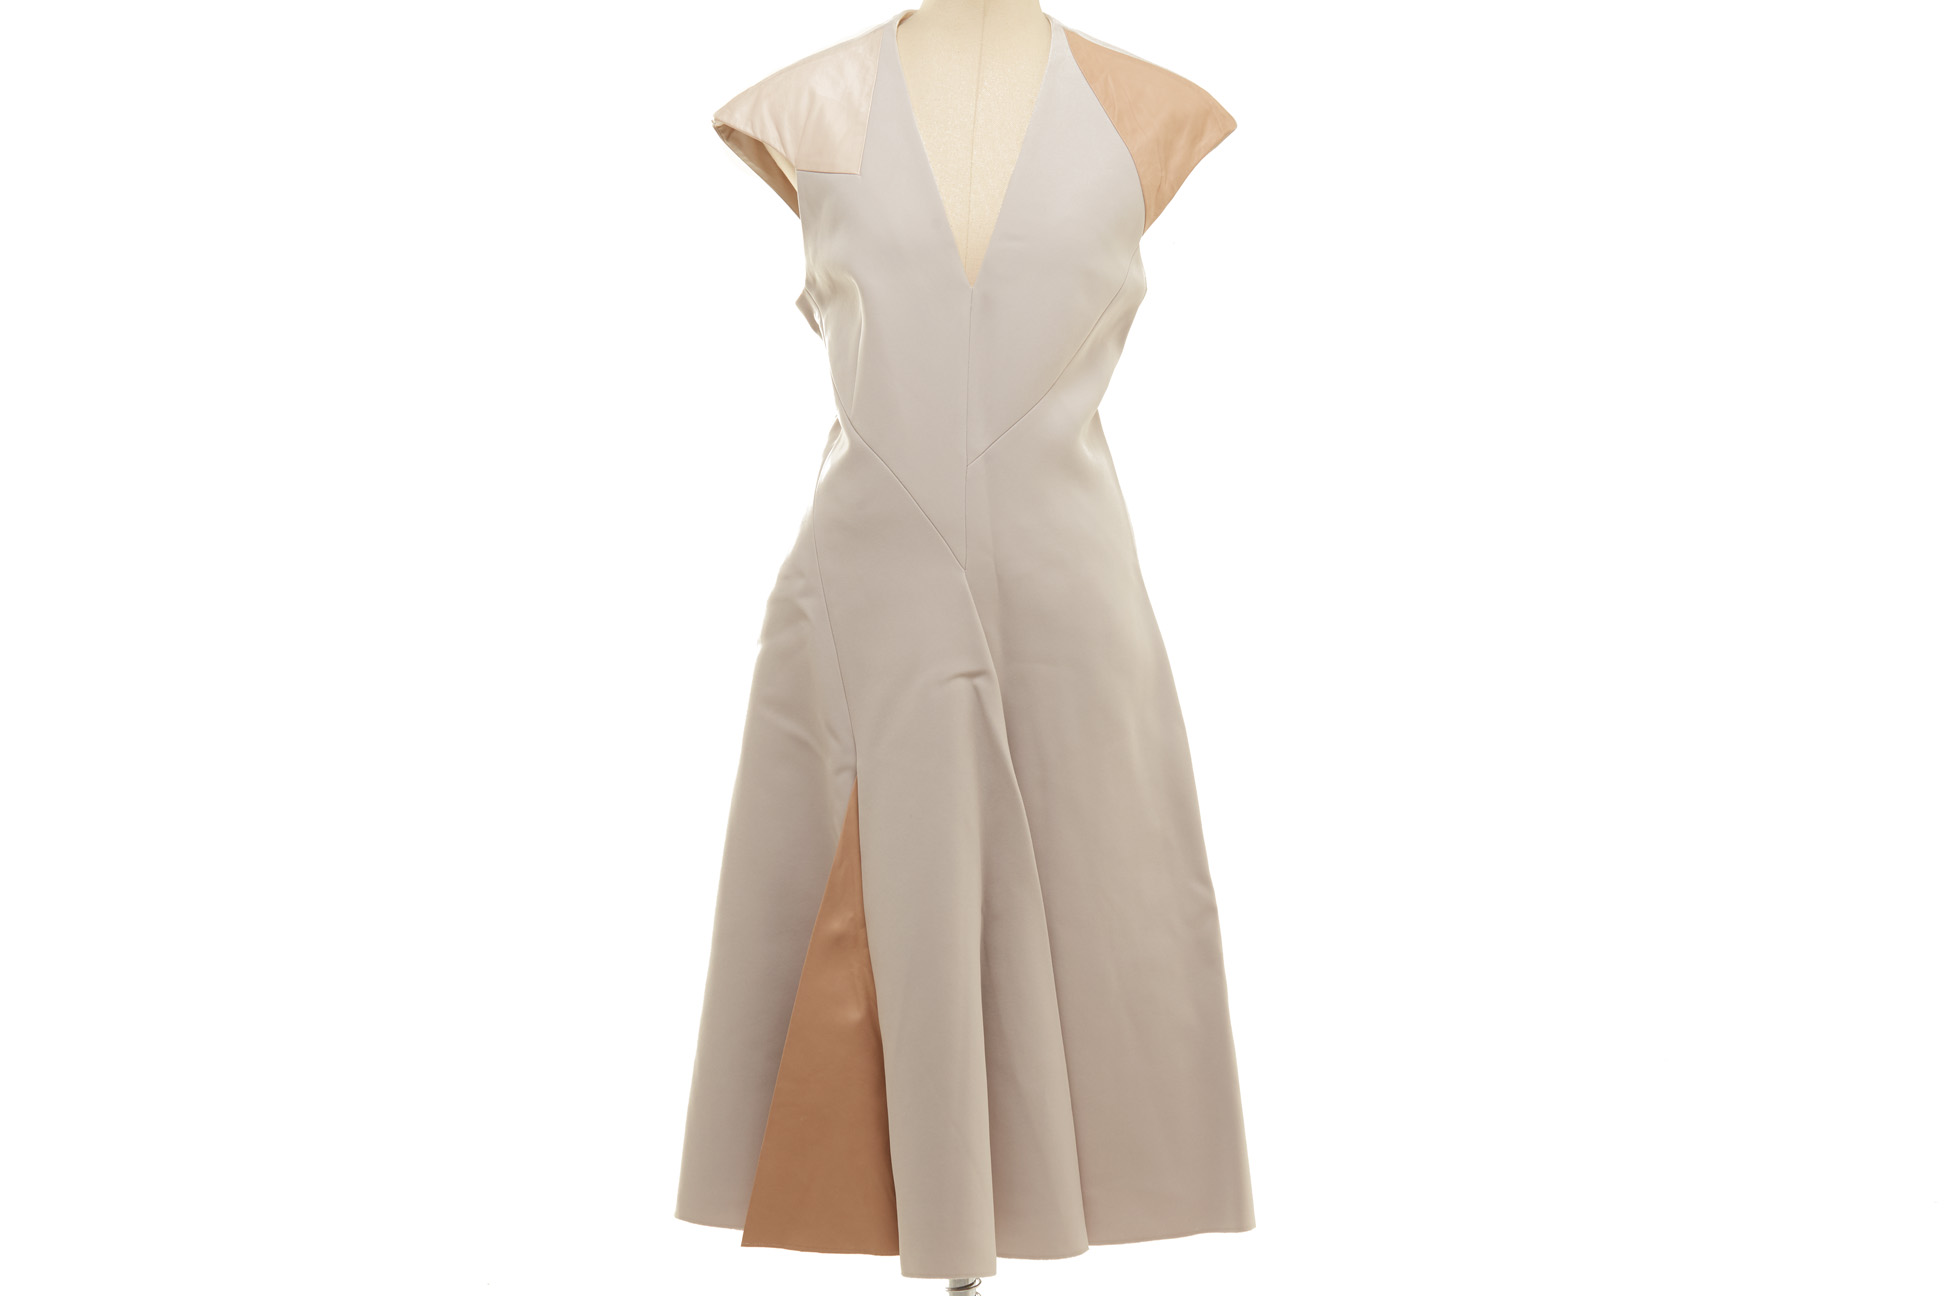 A BOTTEGA VENETA LIGHT GREY SHIFT DRESS